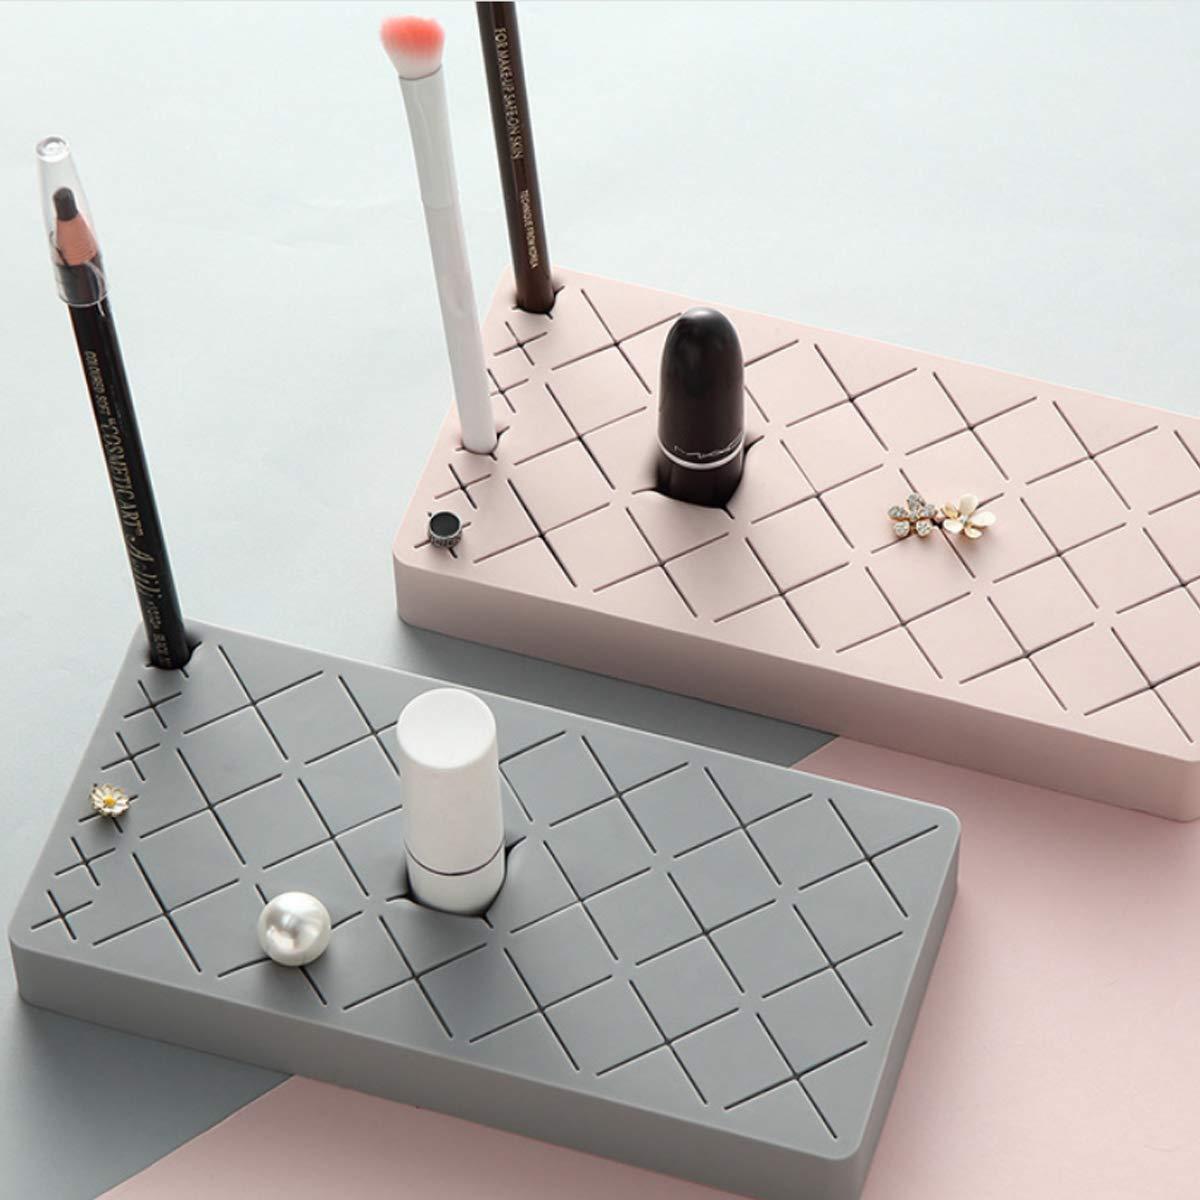 2LL4HM Silicone Lipstick Organizer 18 Space Storage Display For Brush Lipstick Eyebrow pencil Pink